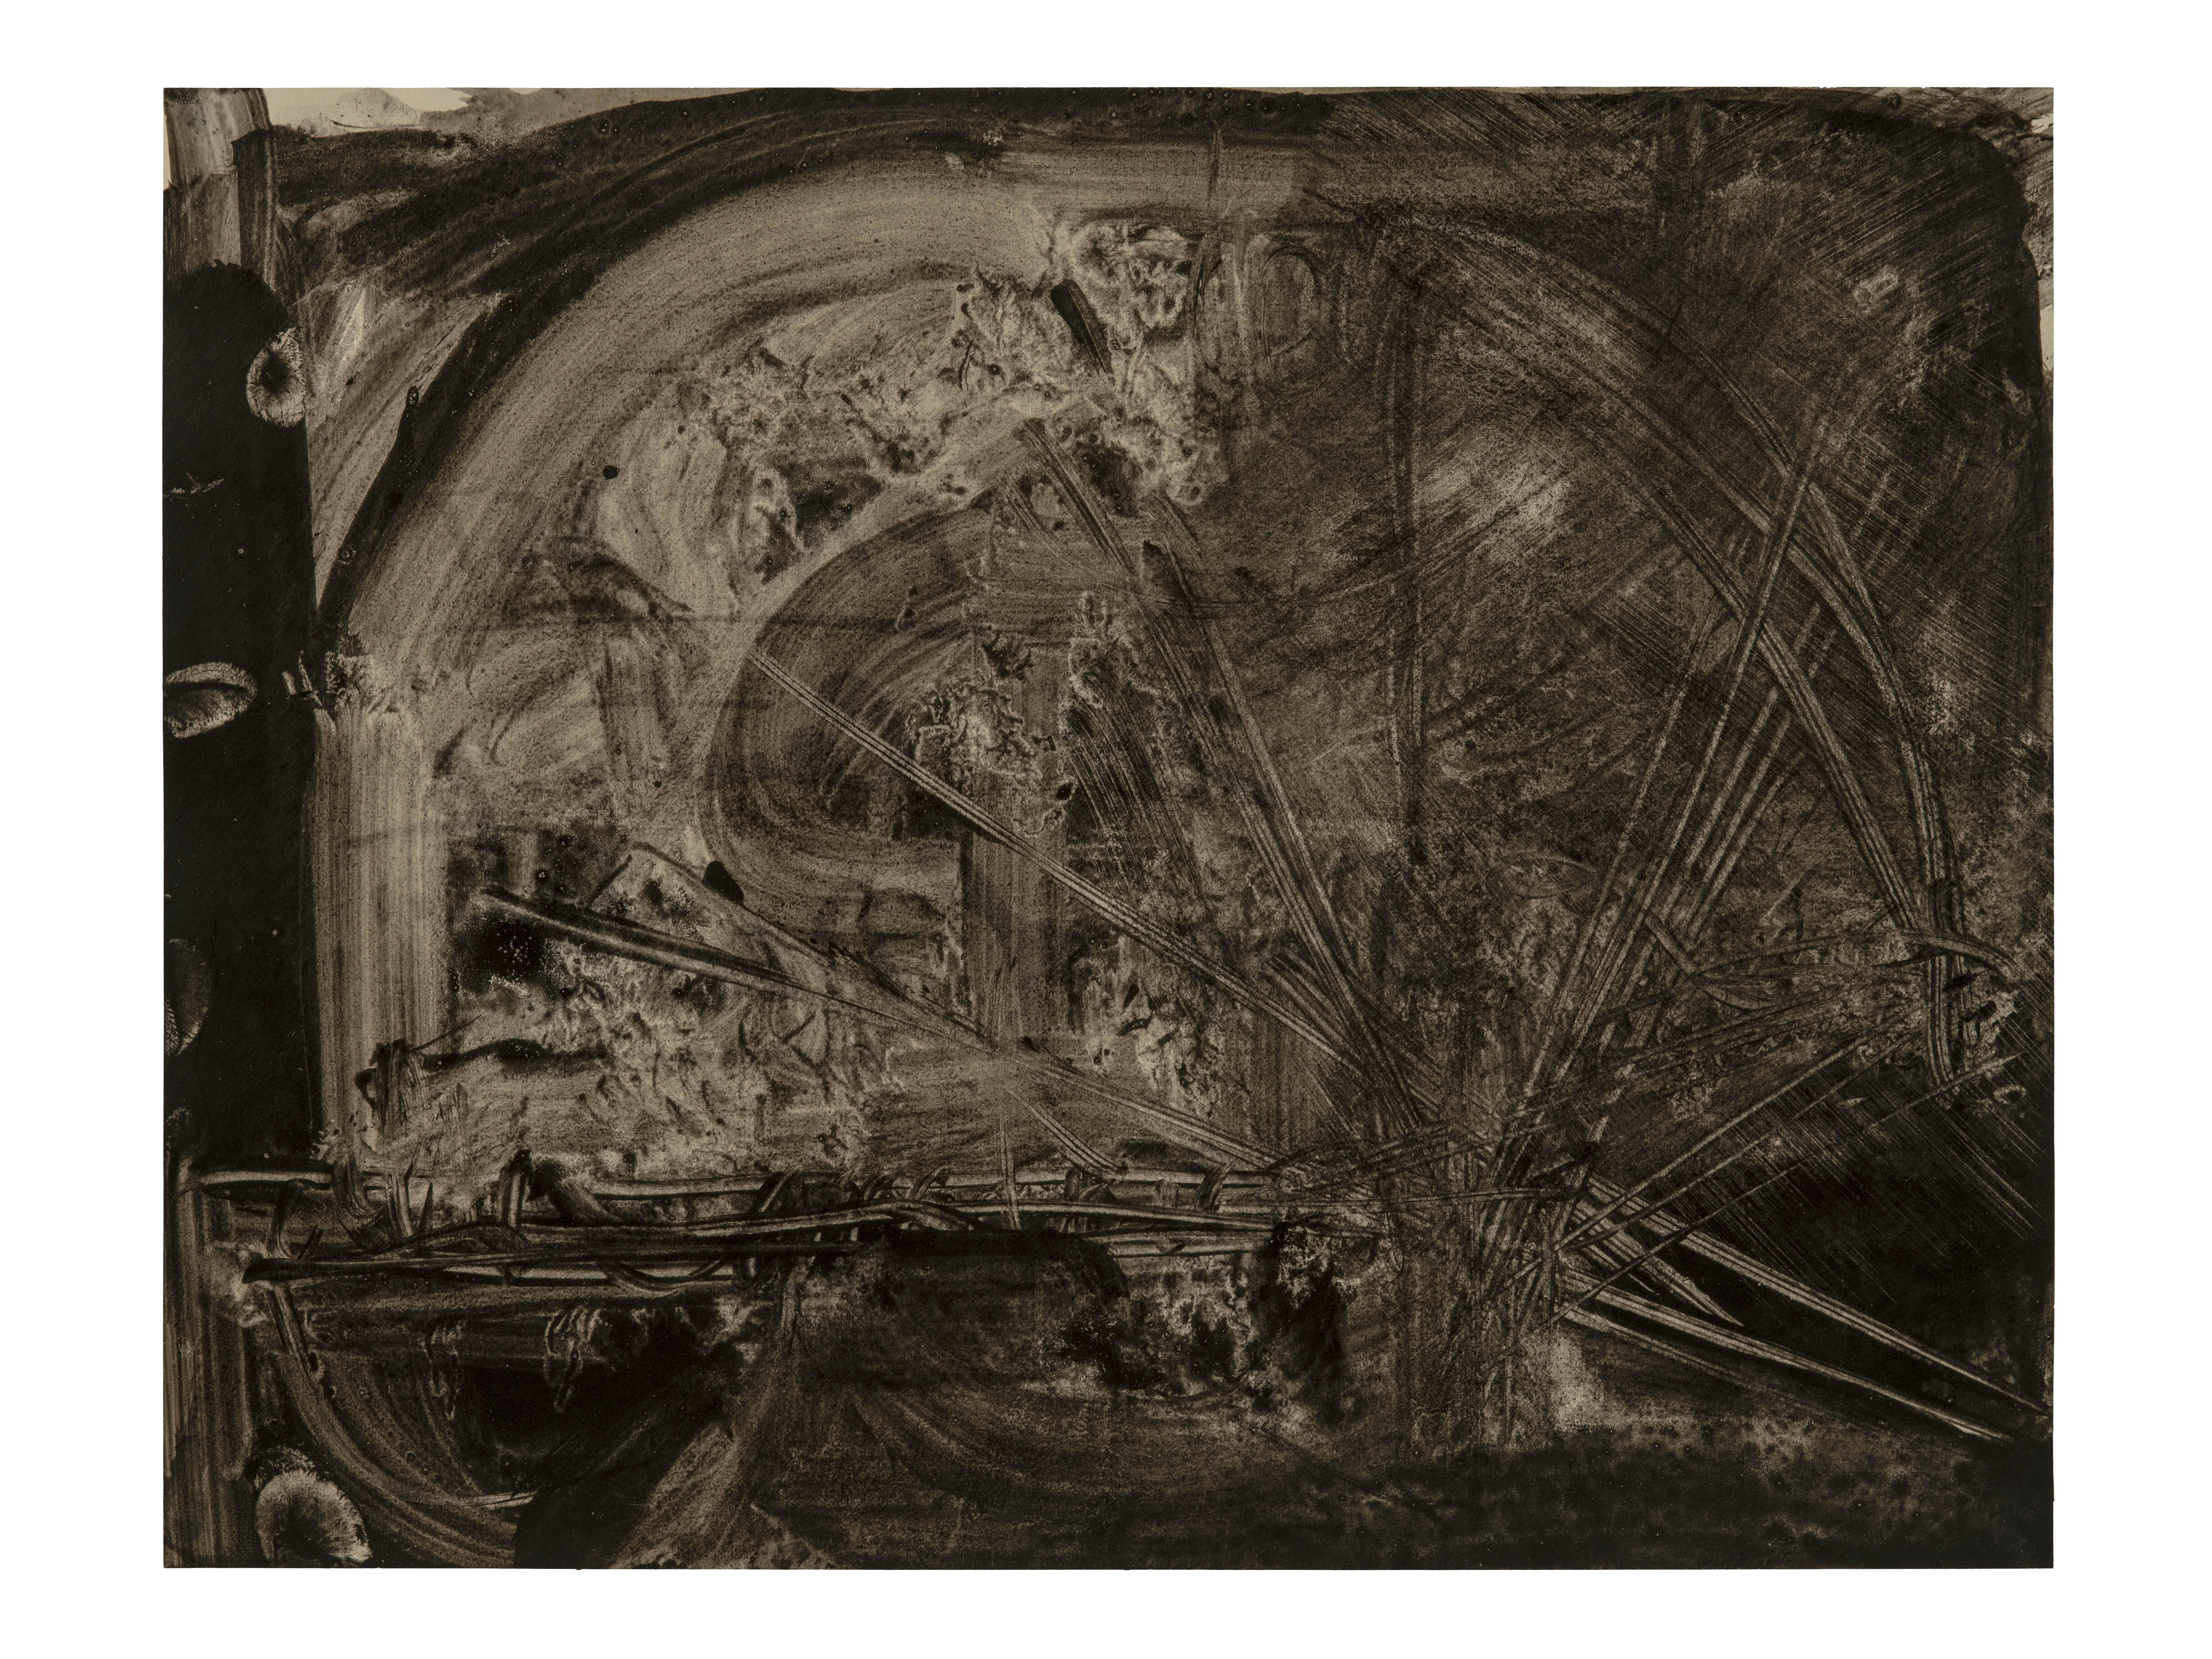 Joachim Probst painting